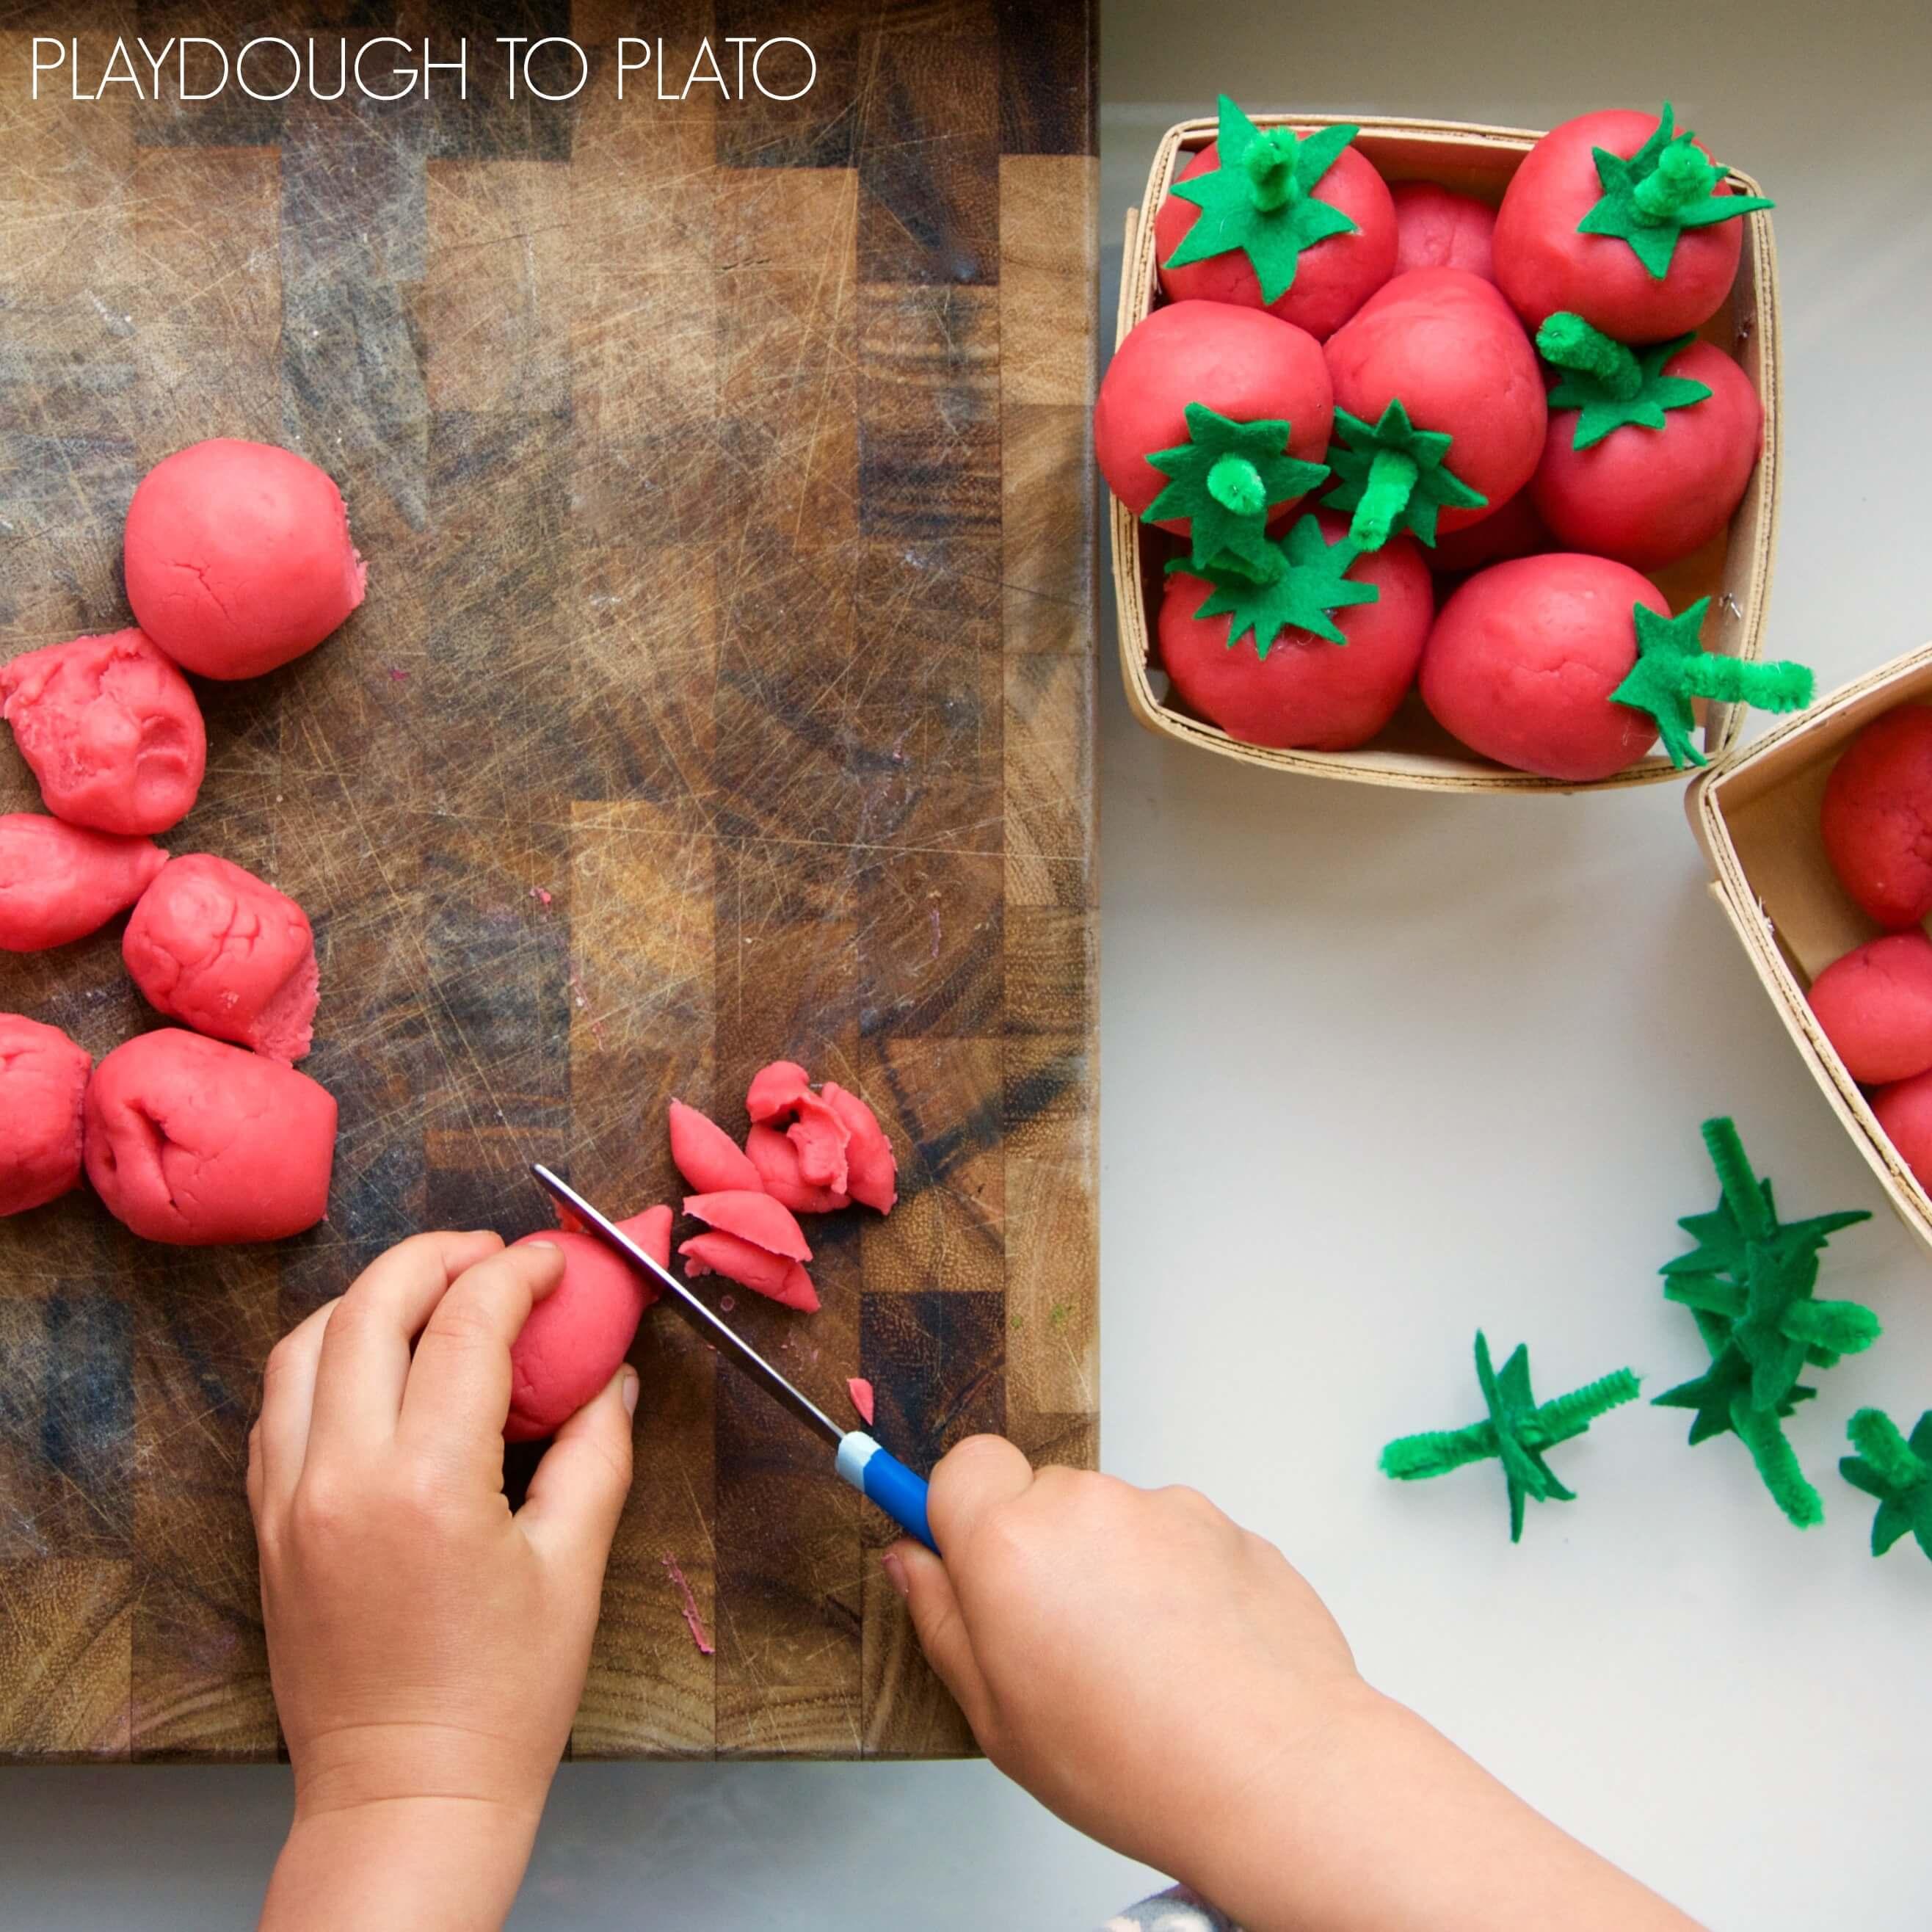 Sun Ripened Strawberry Playdough Playdough To Plato